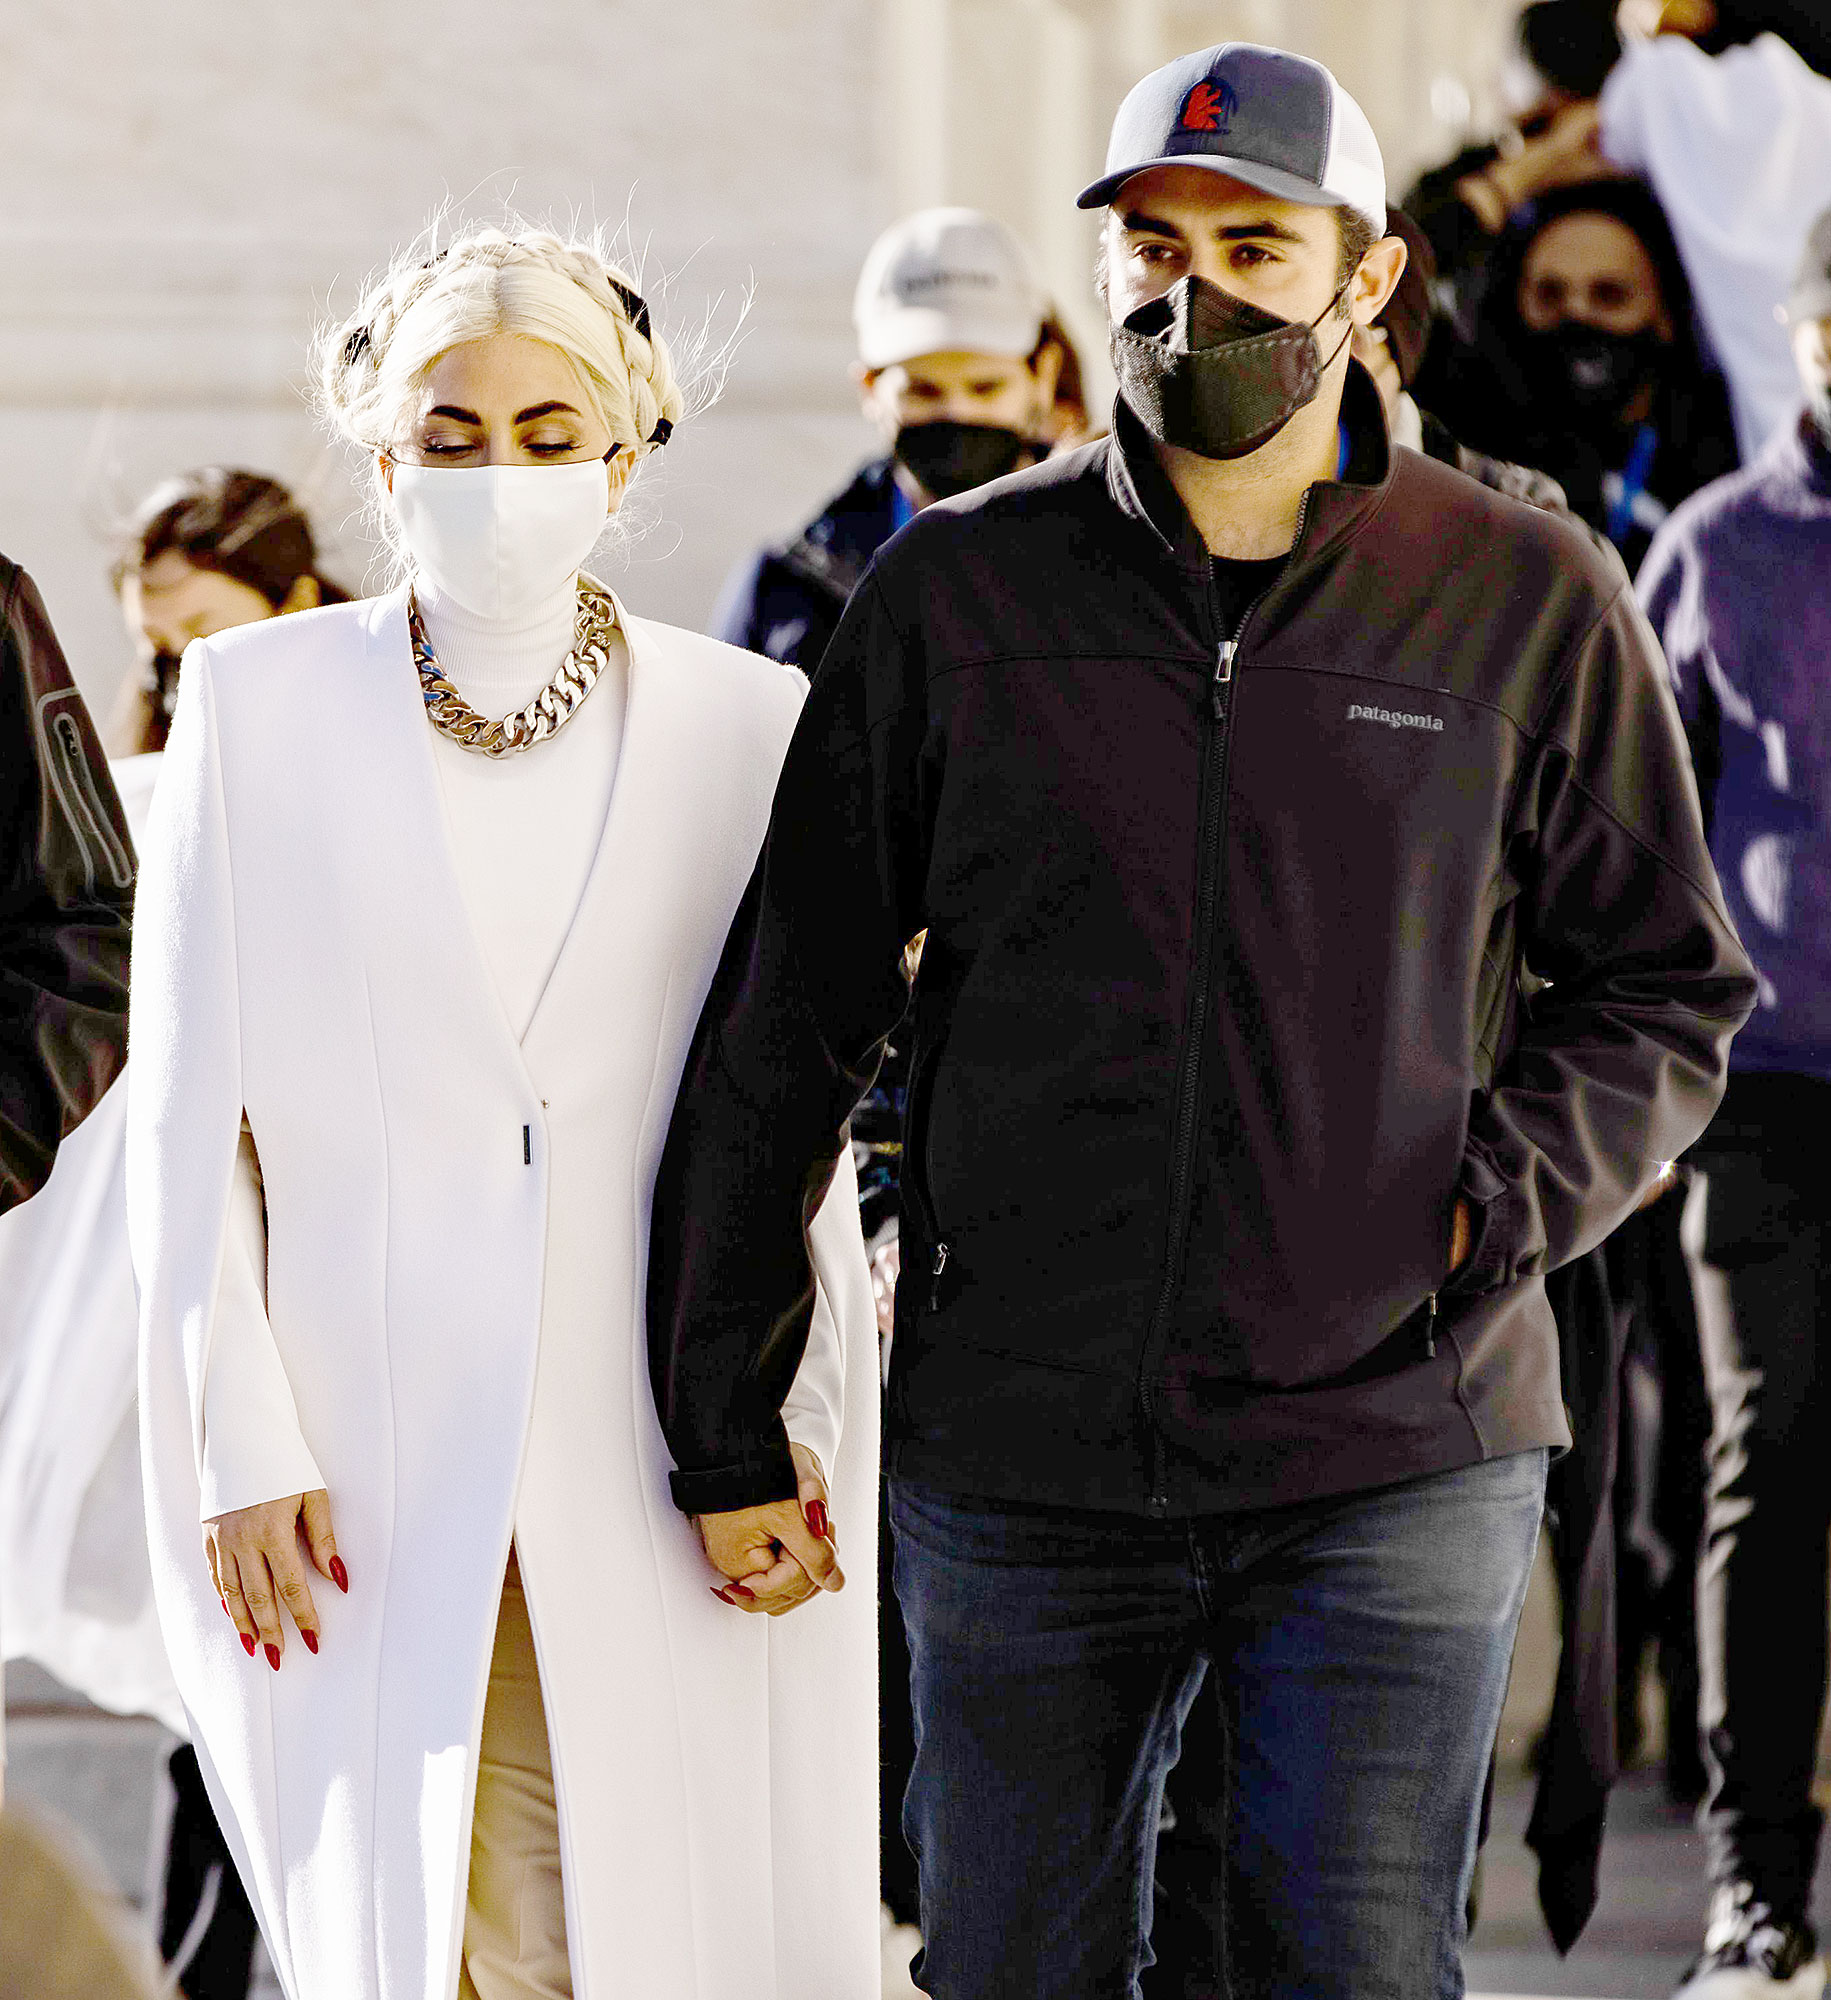 Lady Gaga's Boyfriend Michael Polansky Brings 'Real Stability' to Her Life